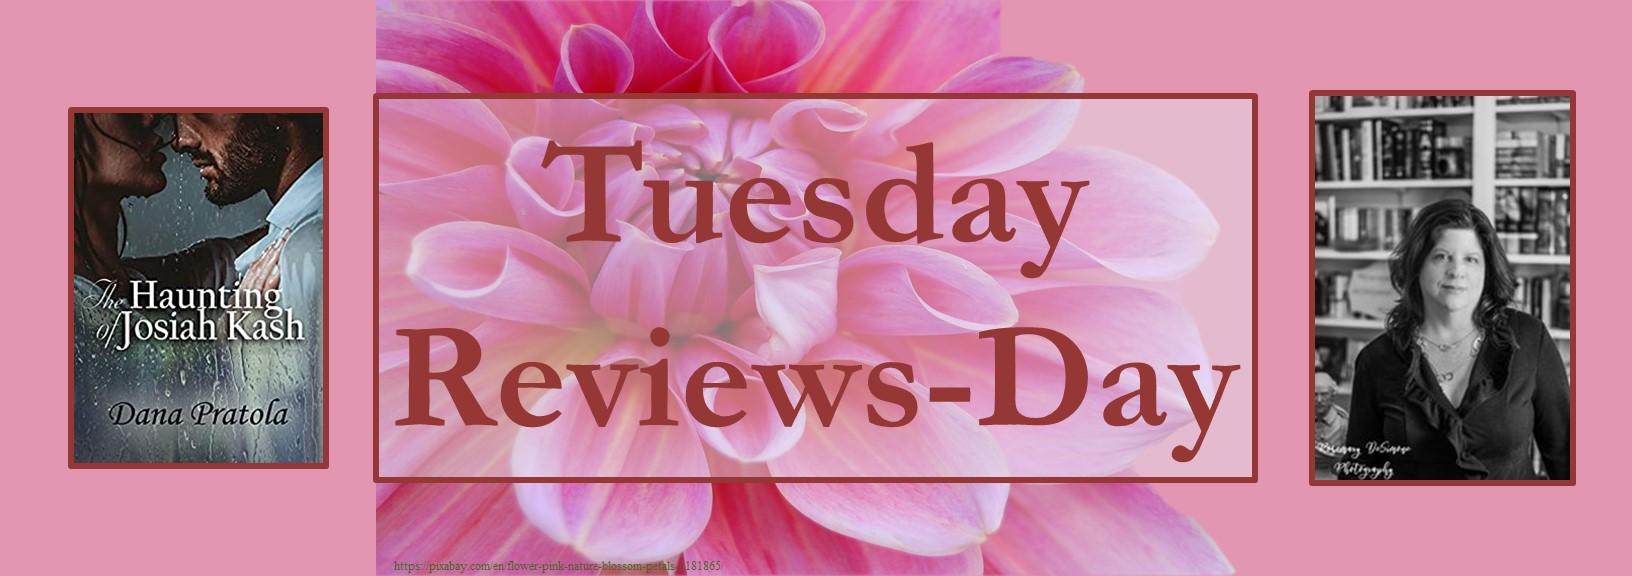 070720 - josiah kash - tuesday reviews day banner